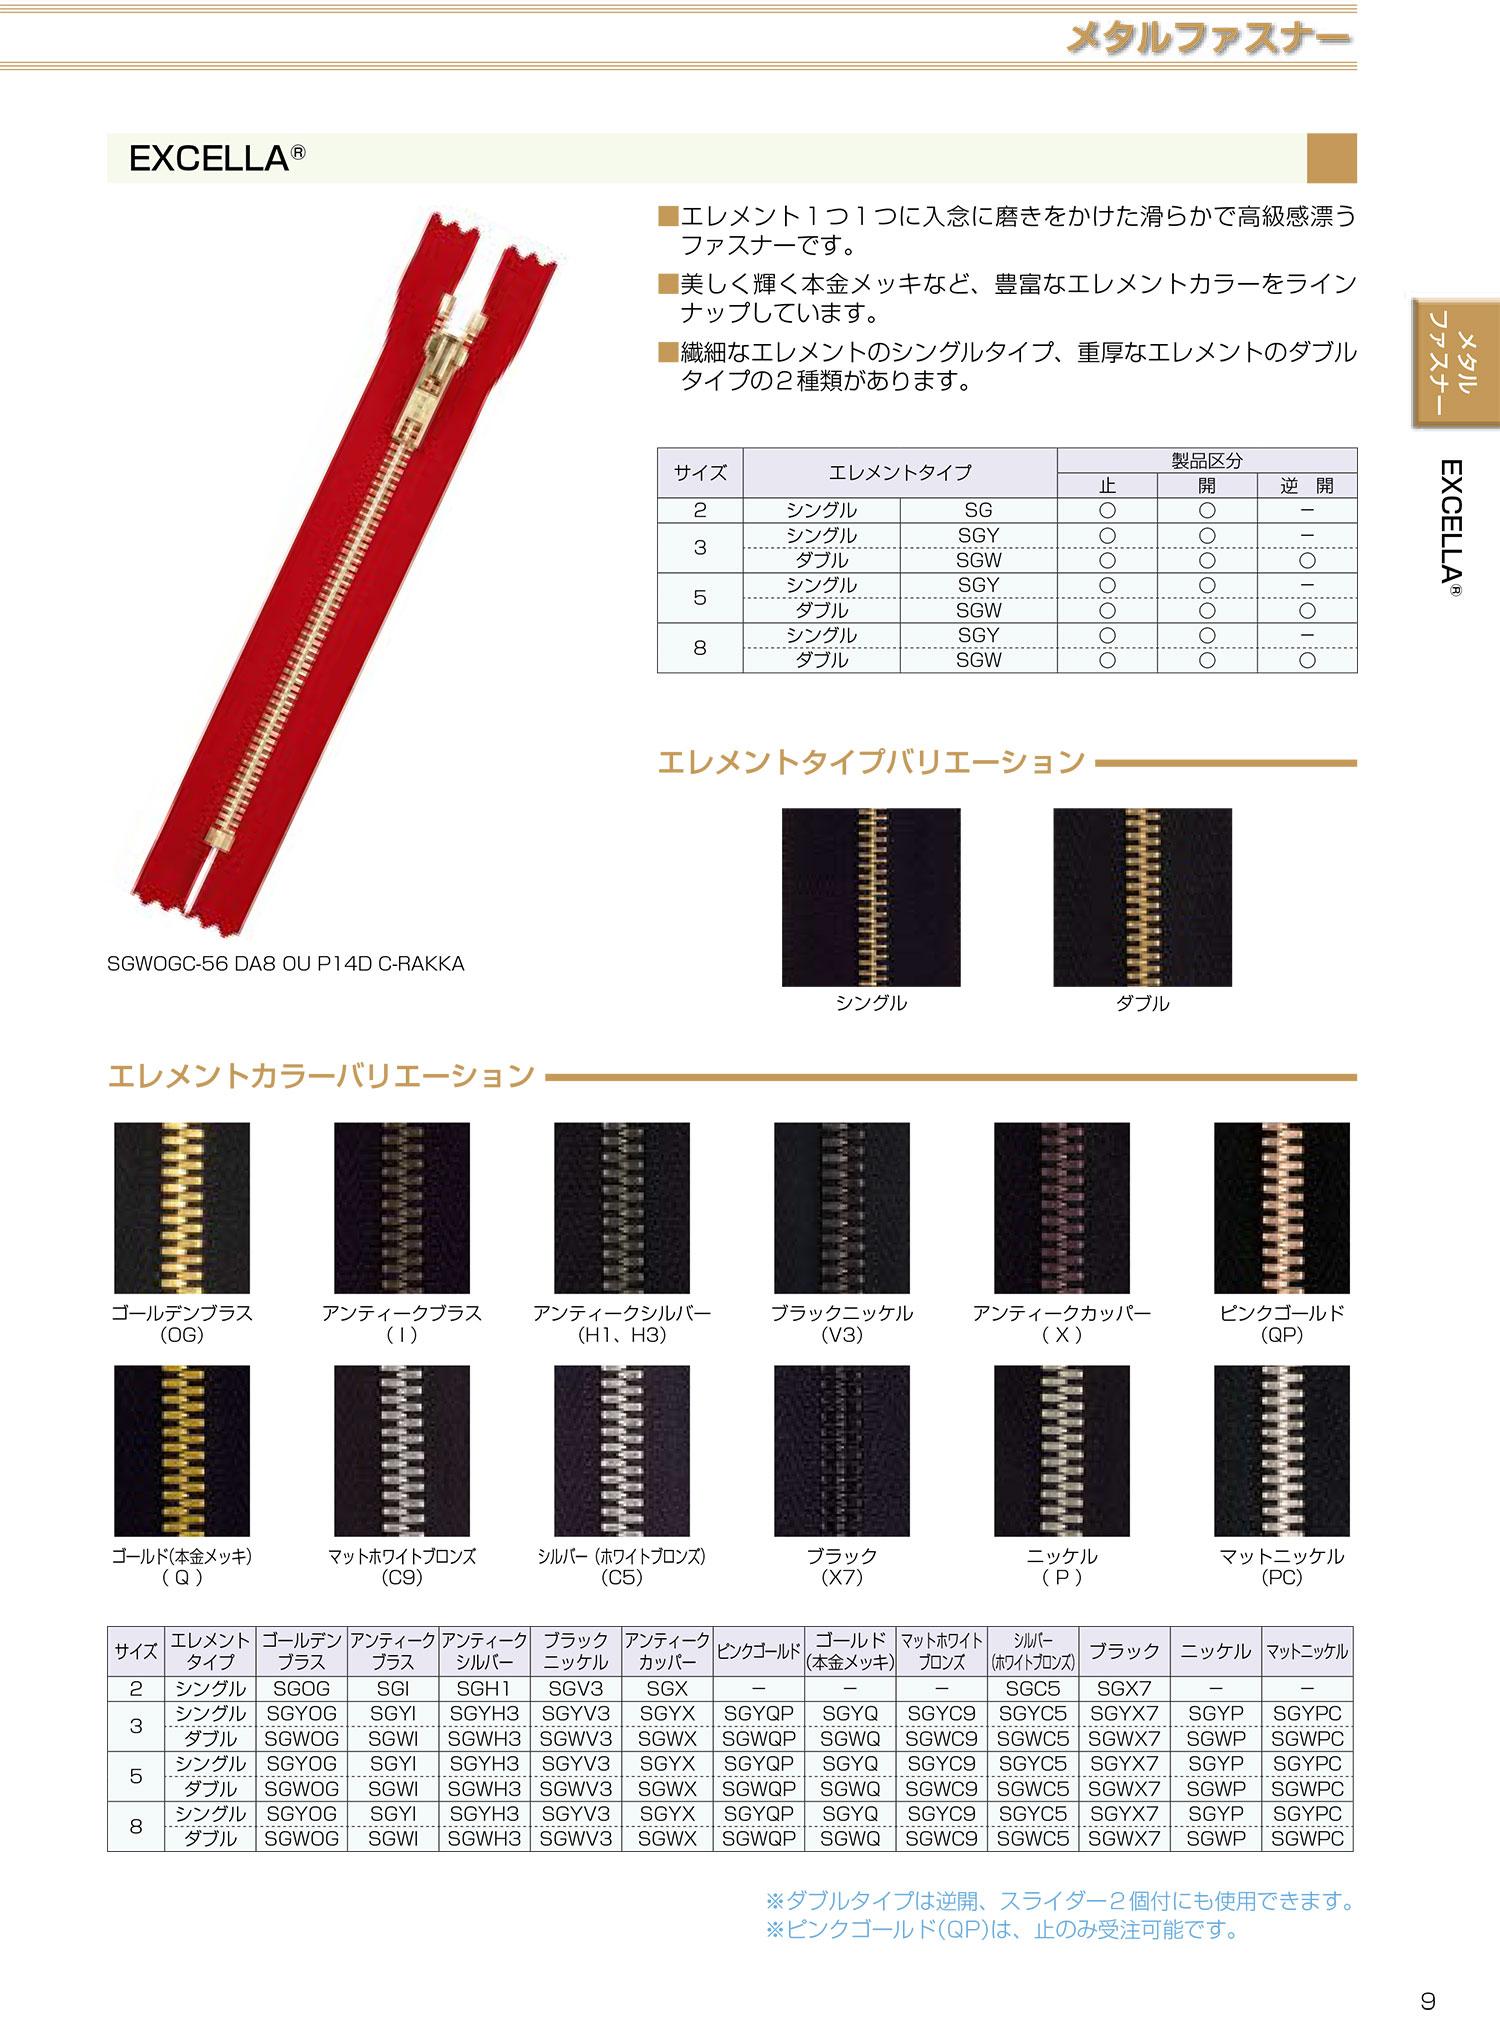 5SGYH3OR エクセラ 5サイズ アンティークシルバー オープン シングル[ファスナー] YKK/オークラ商事 - ApparelX アパレル資材卸通販